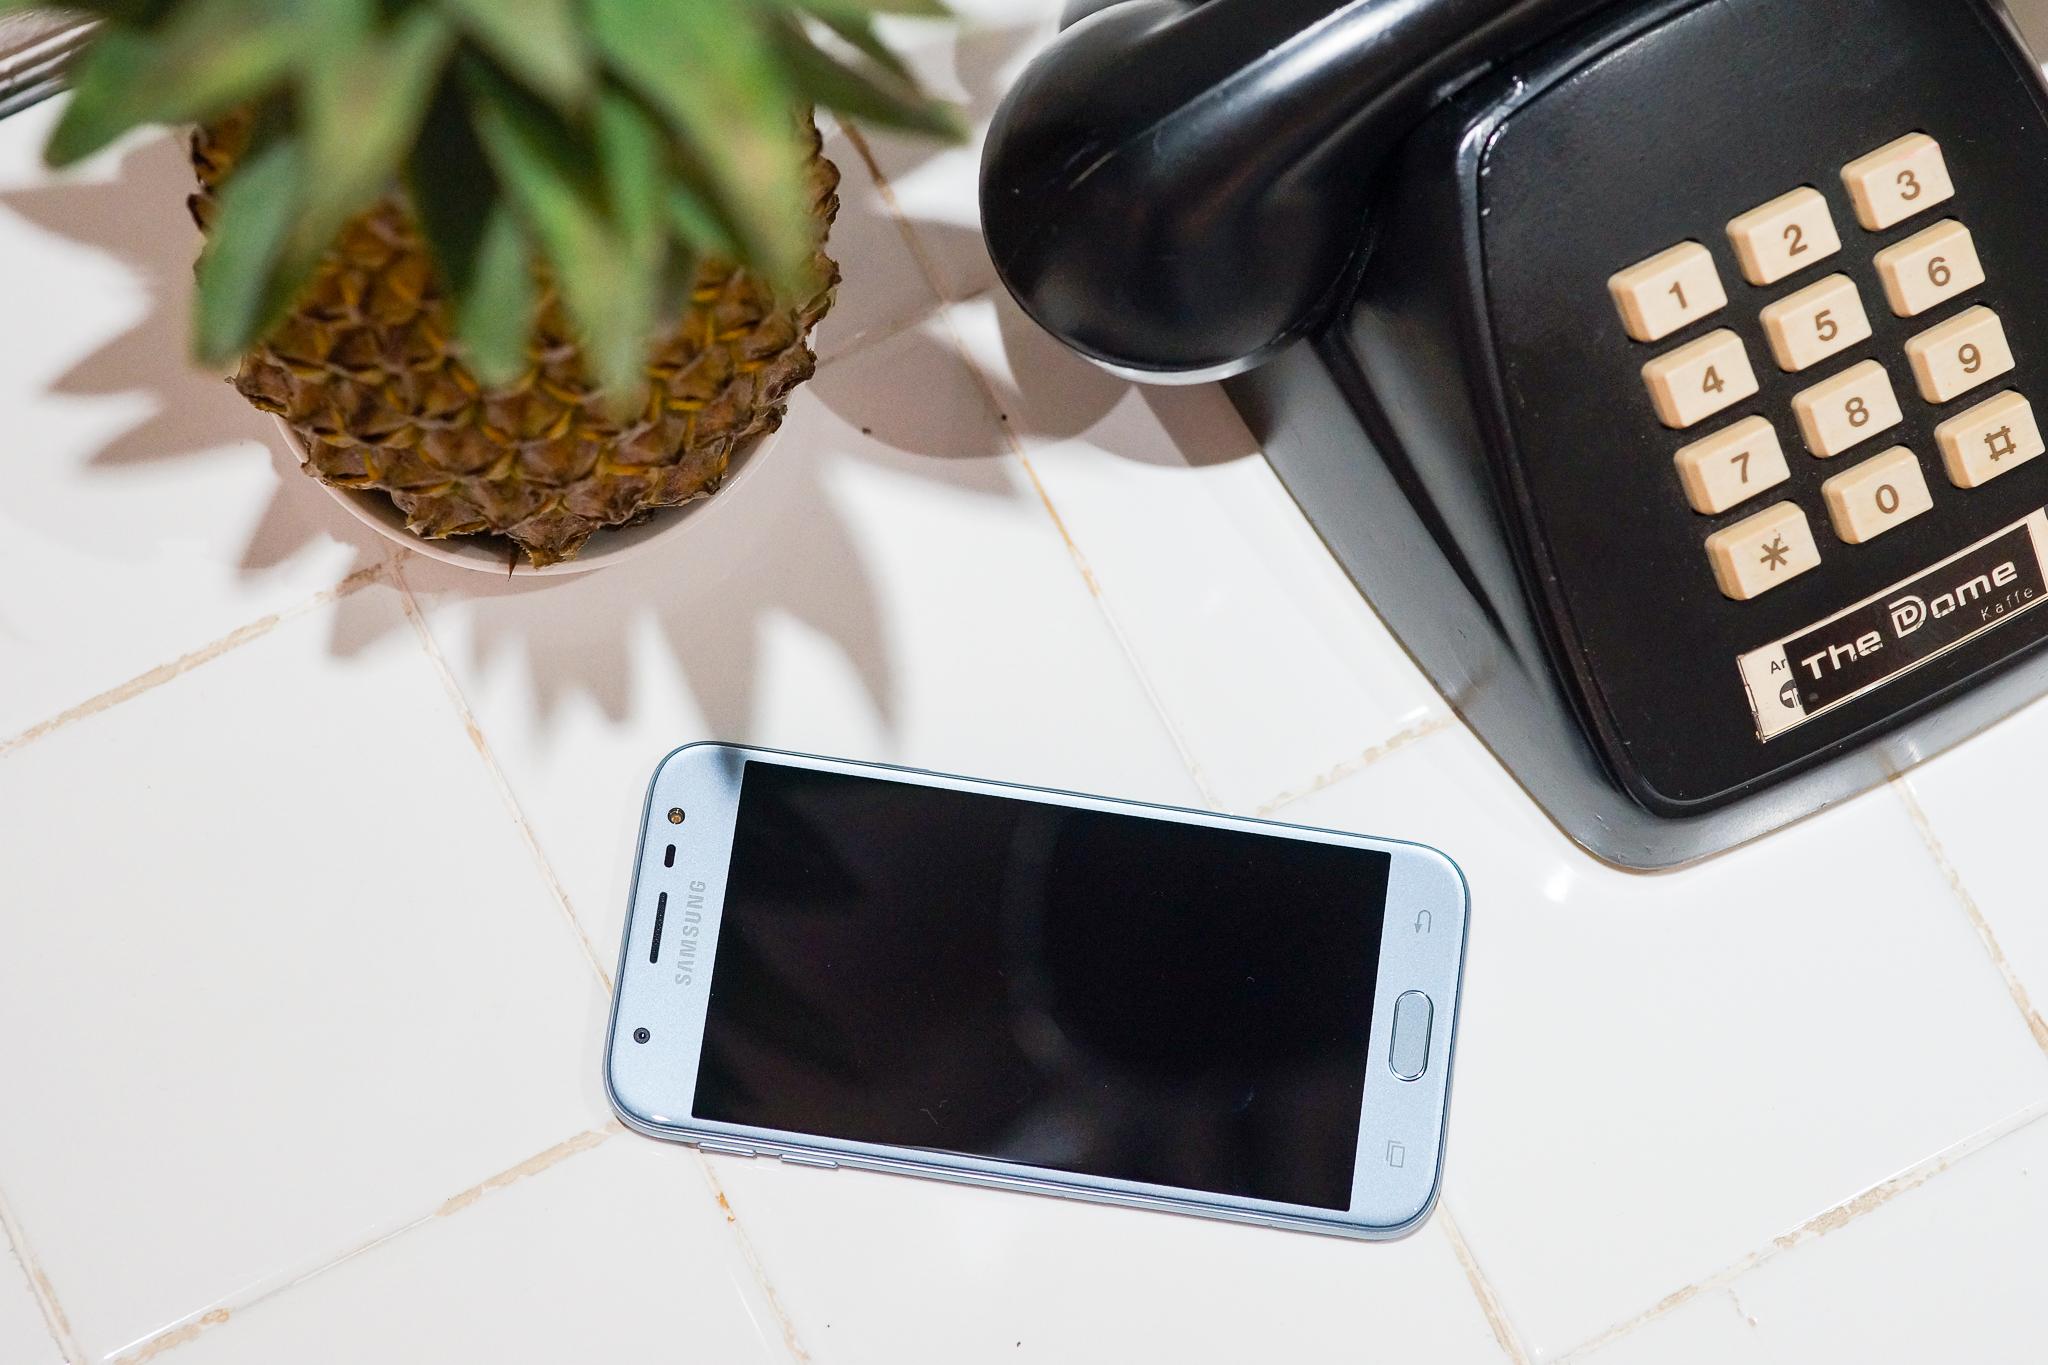 Samsung J3 Pro - Hình 1